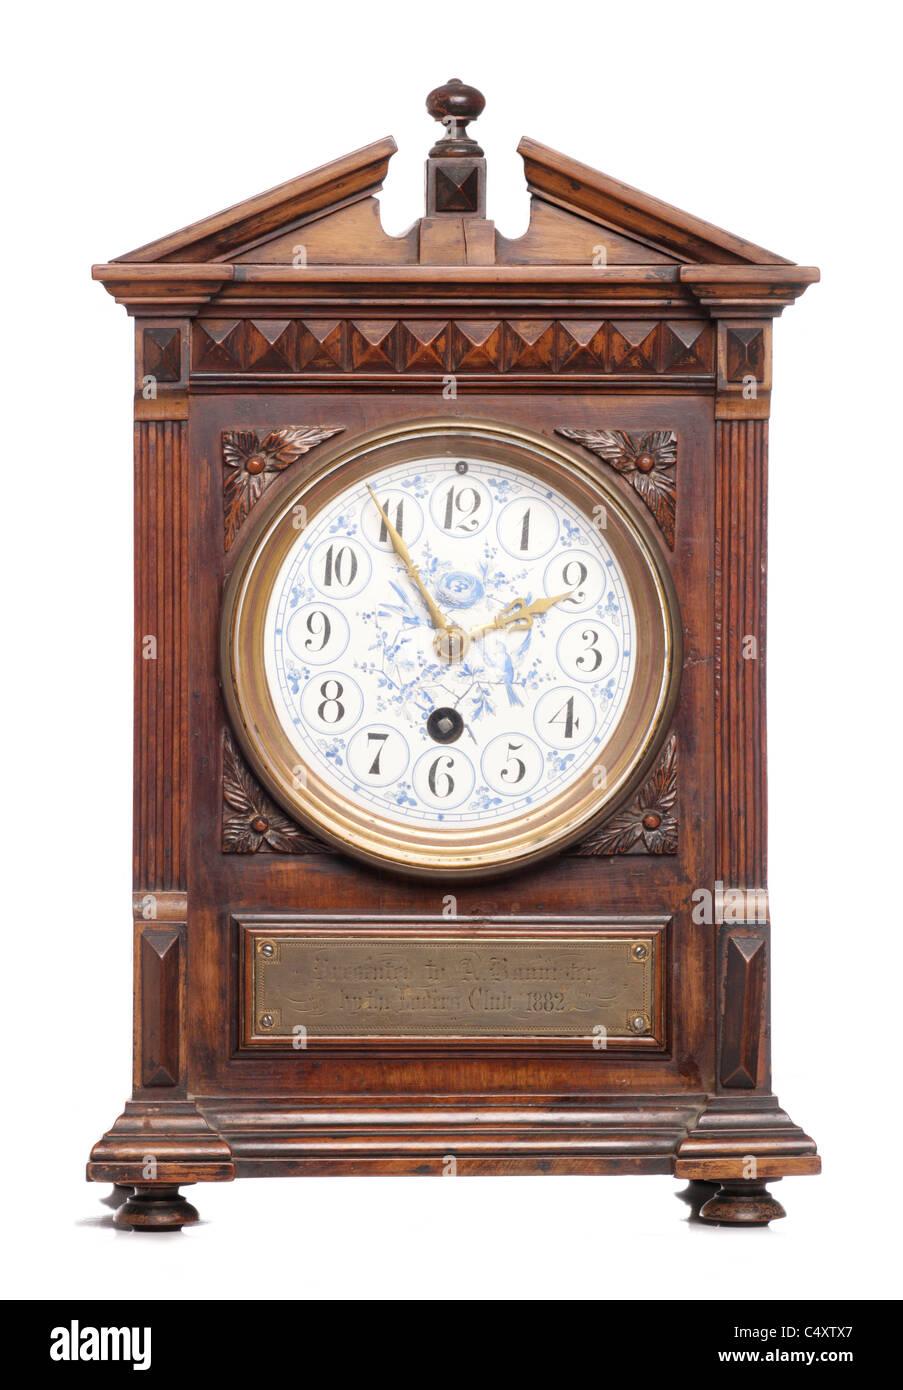 antique clock isolated on white background - Stock Image